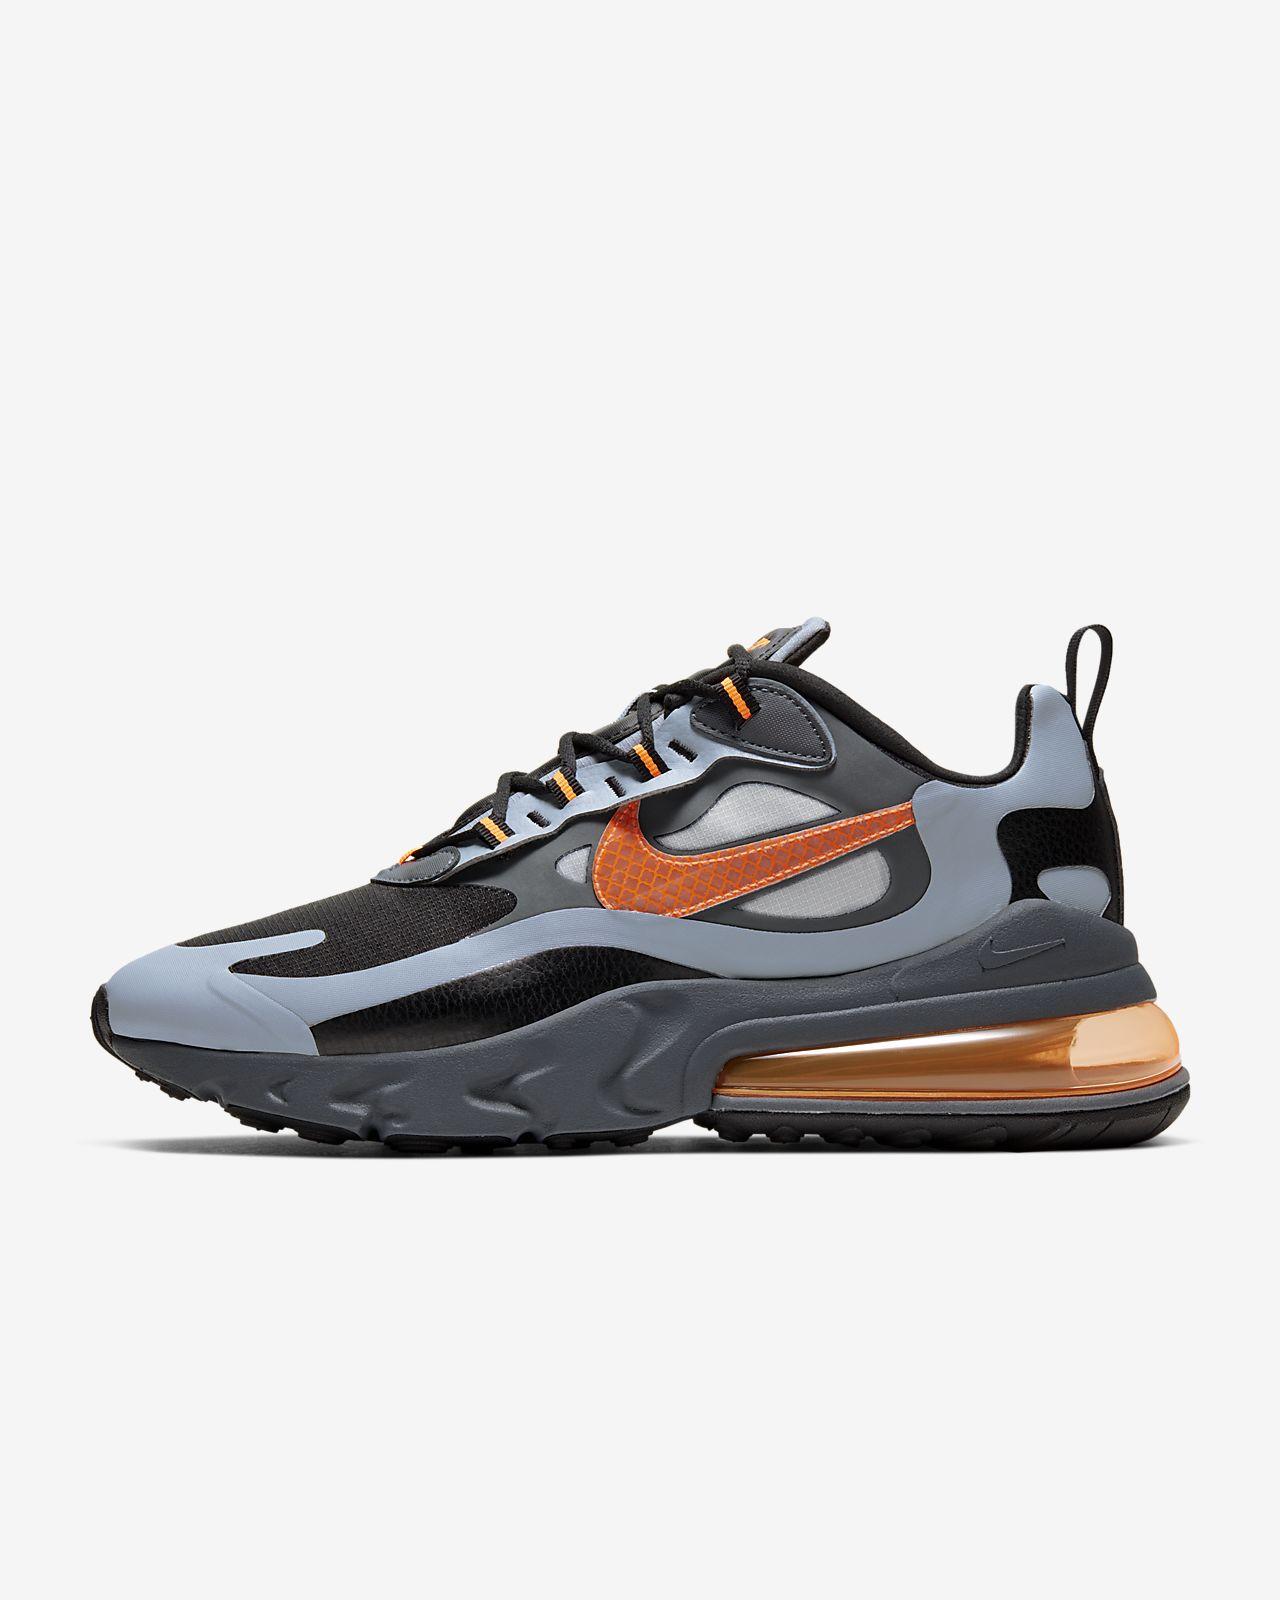 air max 270 react orange